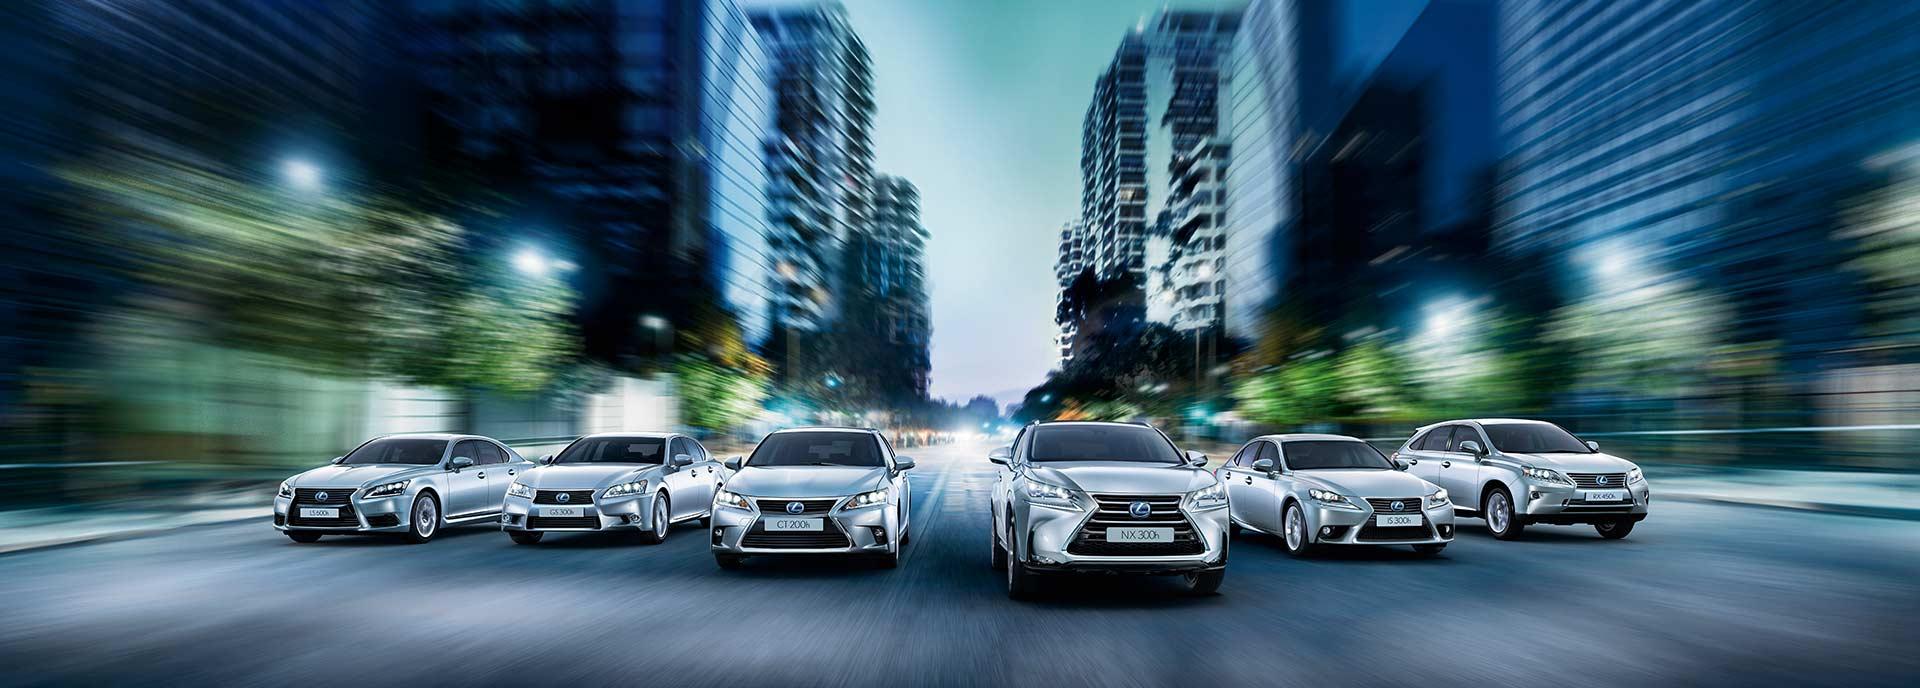 Lexus Business Editions Hero Image